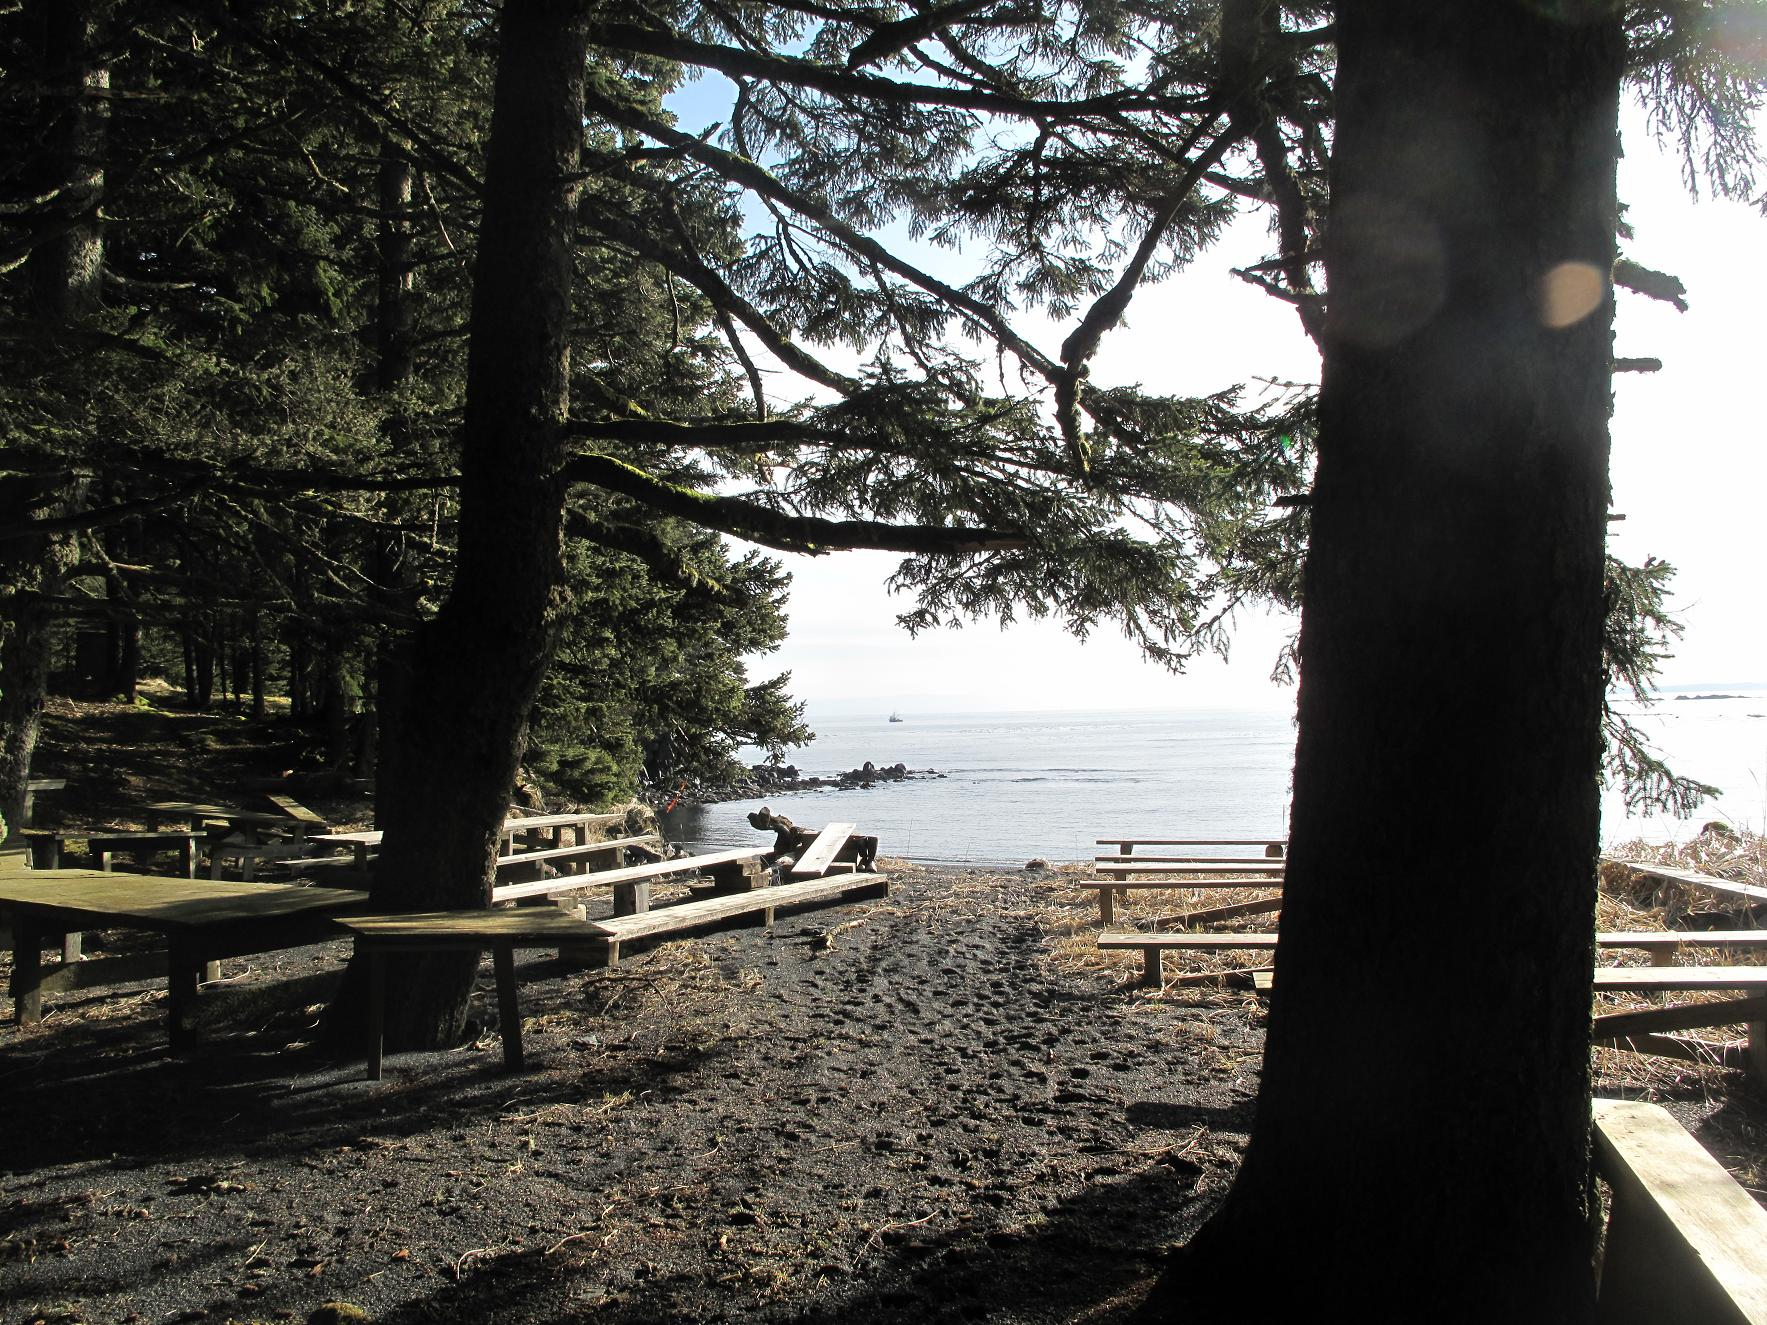 Insula Spruce / Kodiak / Alaska